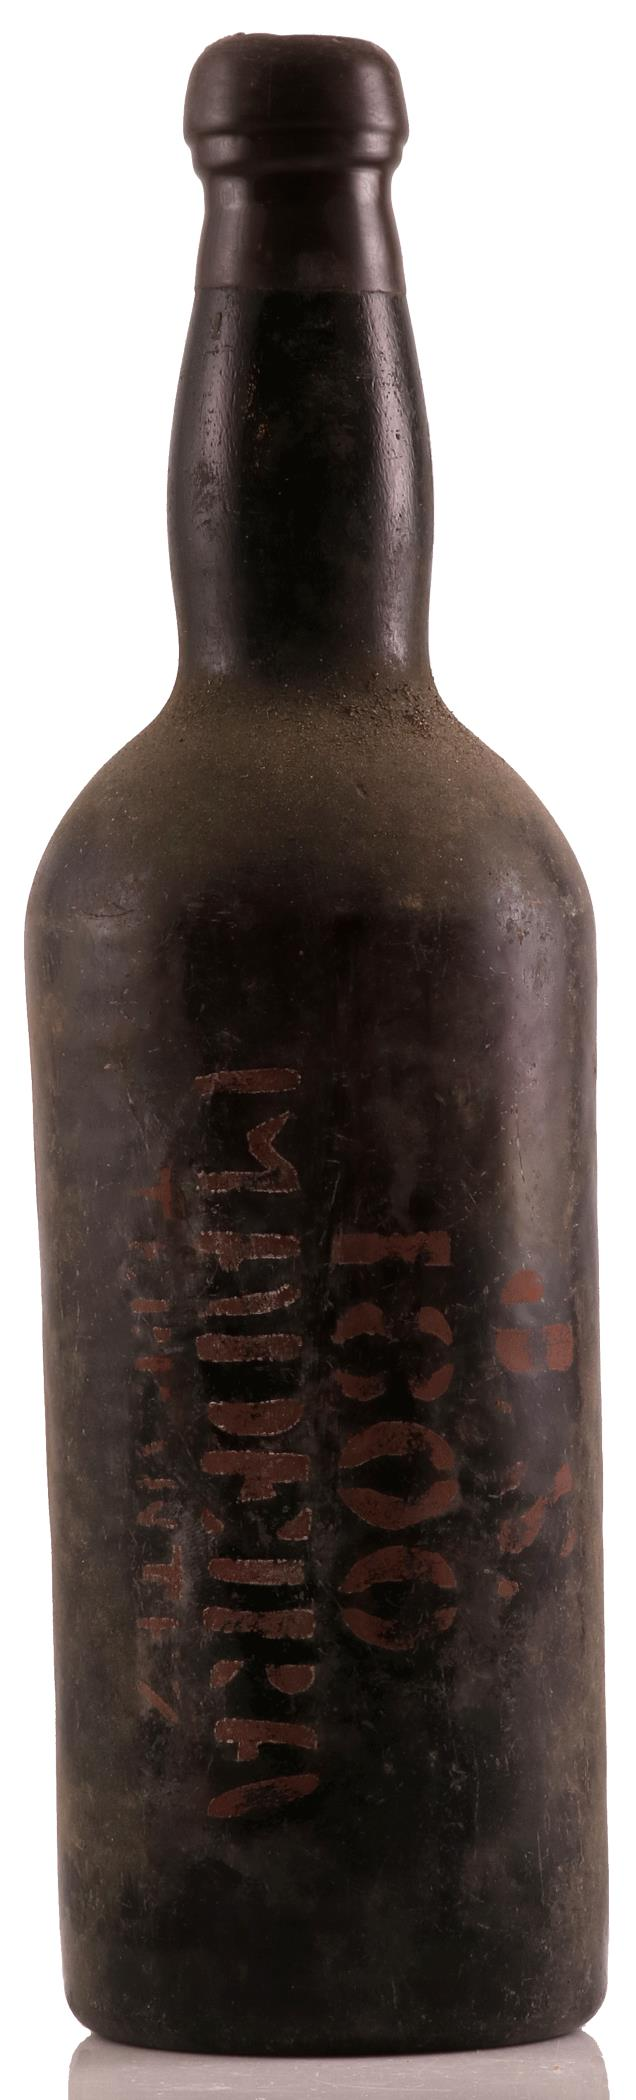 Madeira 1800 J.S. Terrantez